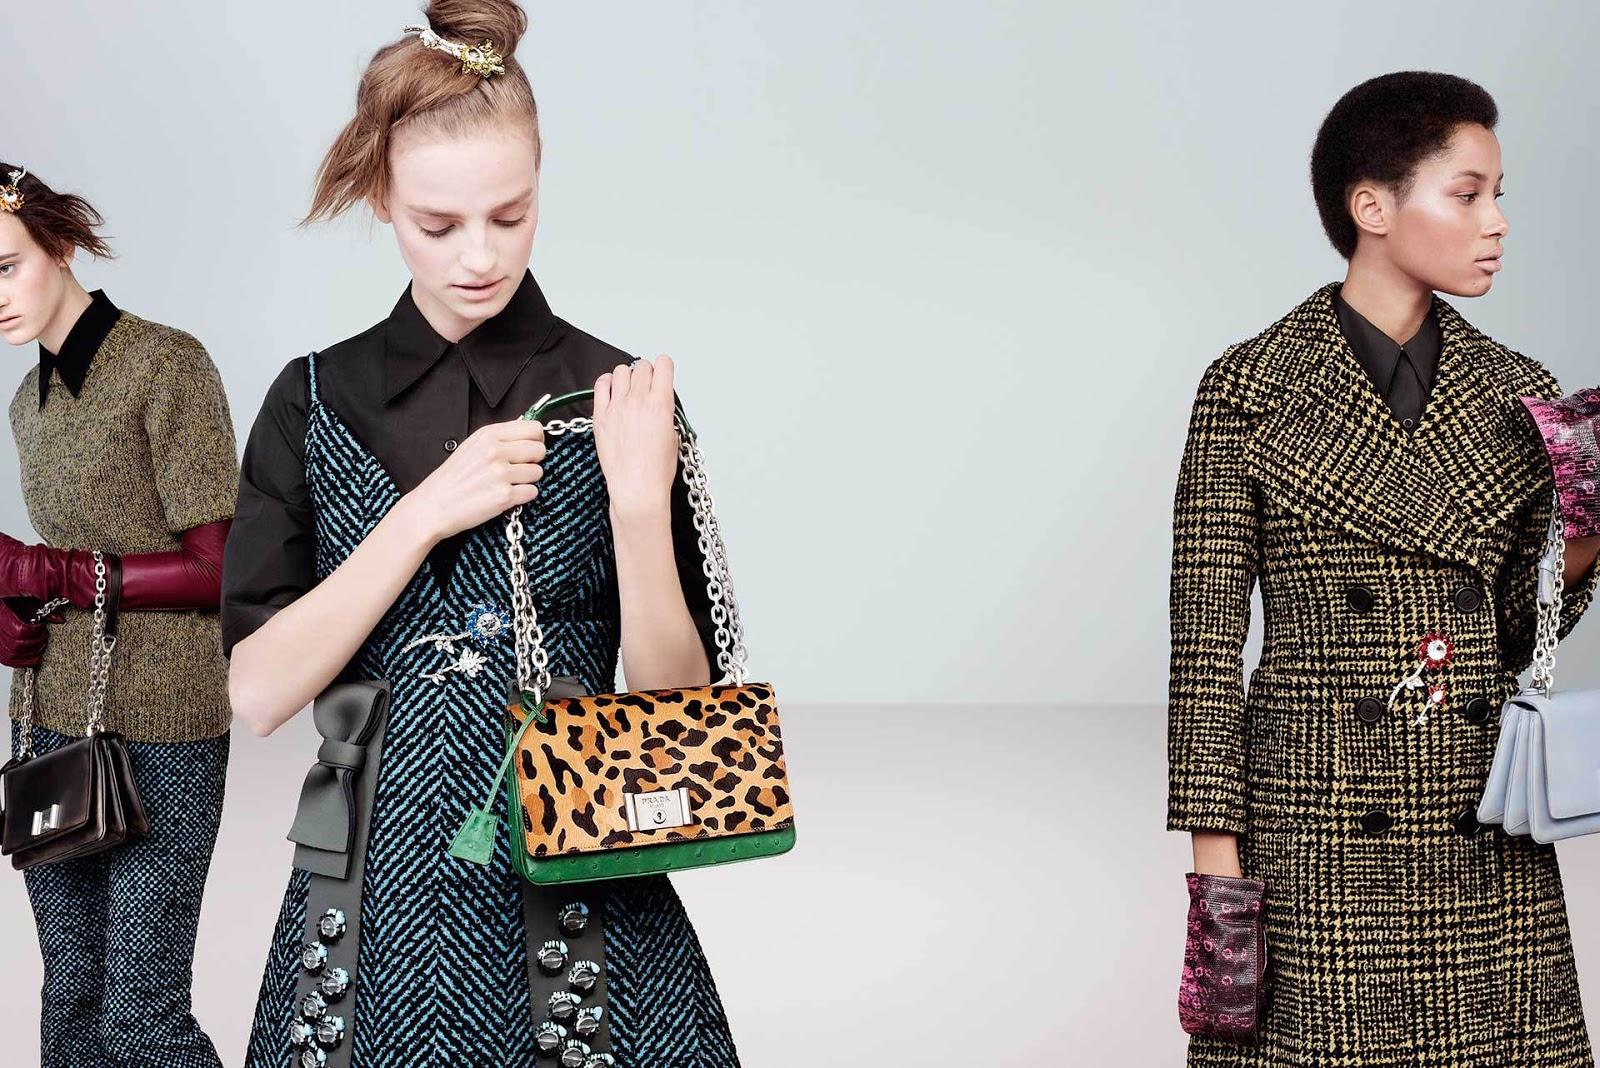 Watch Prada AutumnWinter 2013 Campaign video